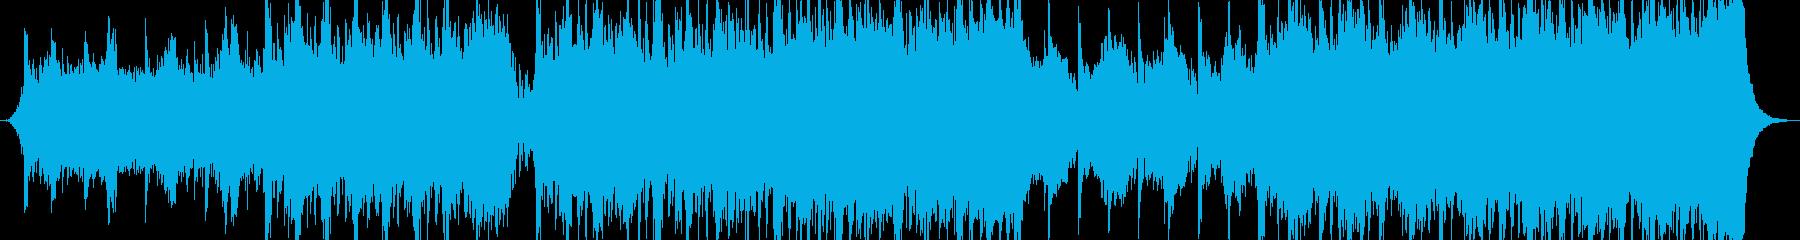 Orchestral musicの再生済みの波形